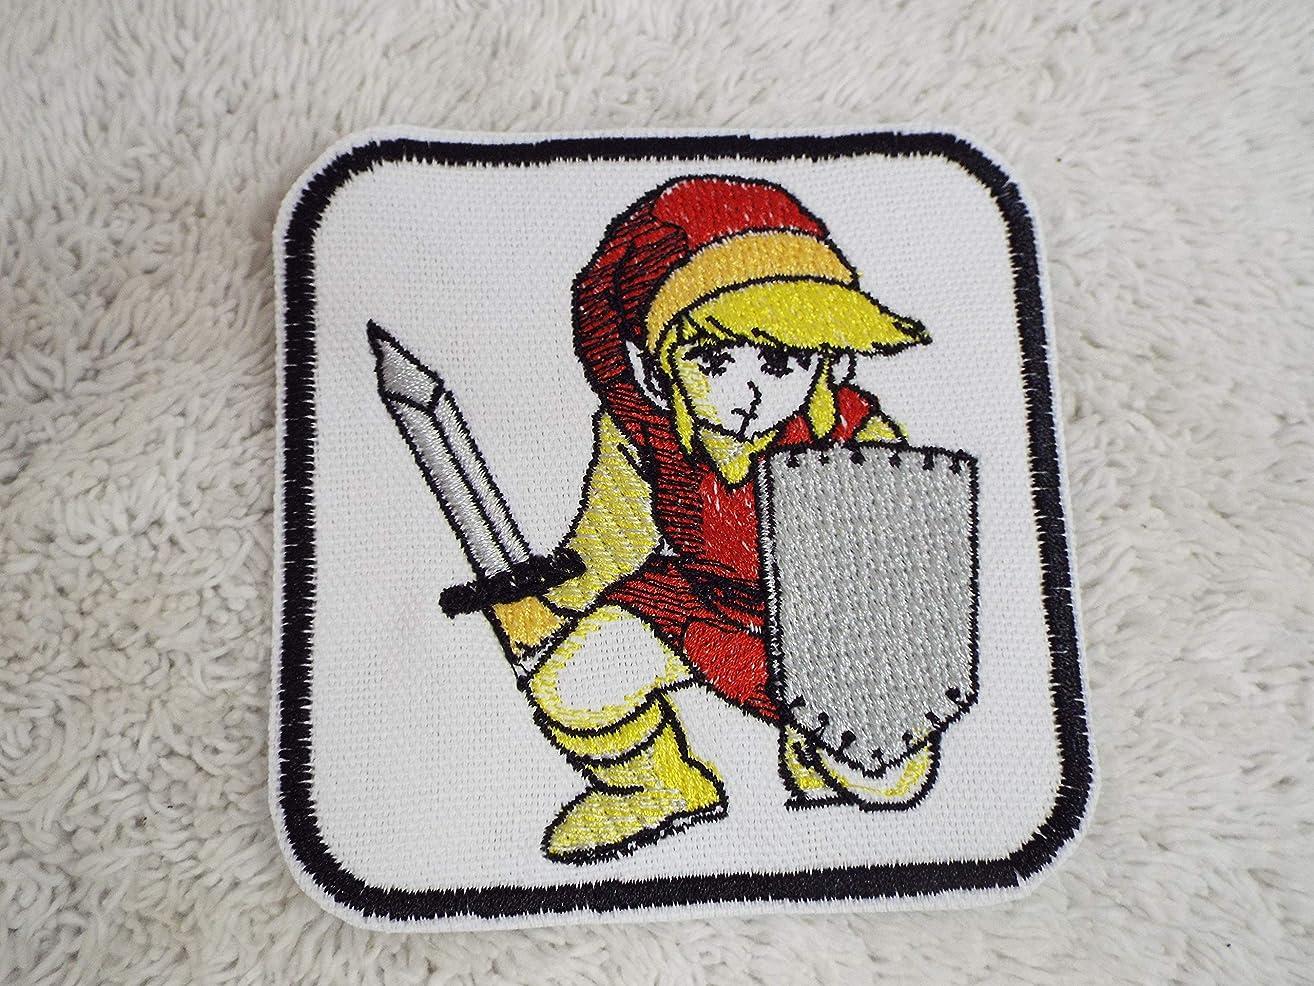 Legend of Zelda Game Red LINK Kneeling Sword Embroidered Iron-on Patch